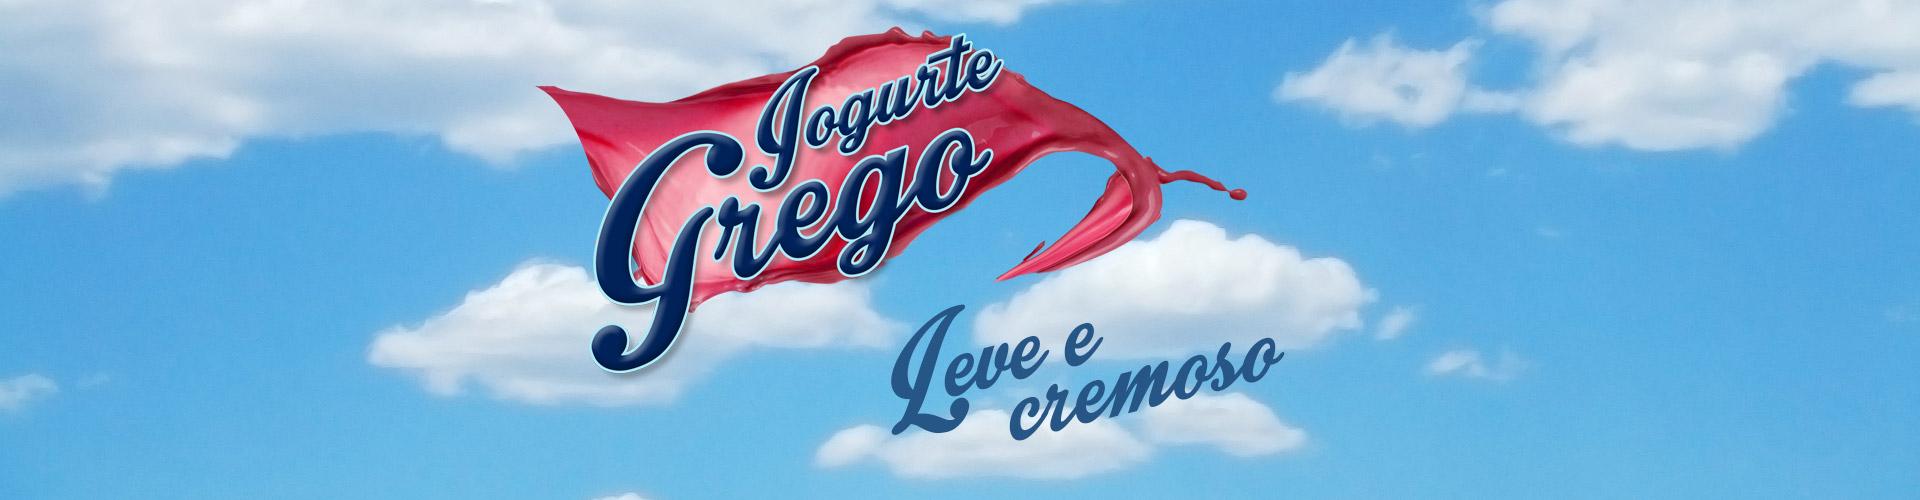 b_iogurte.jpg